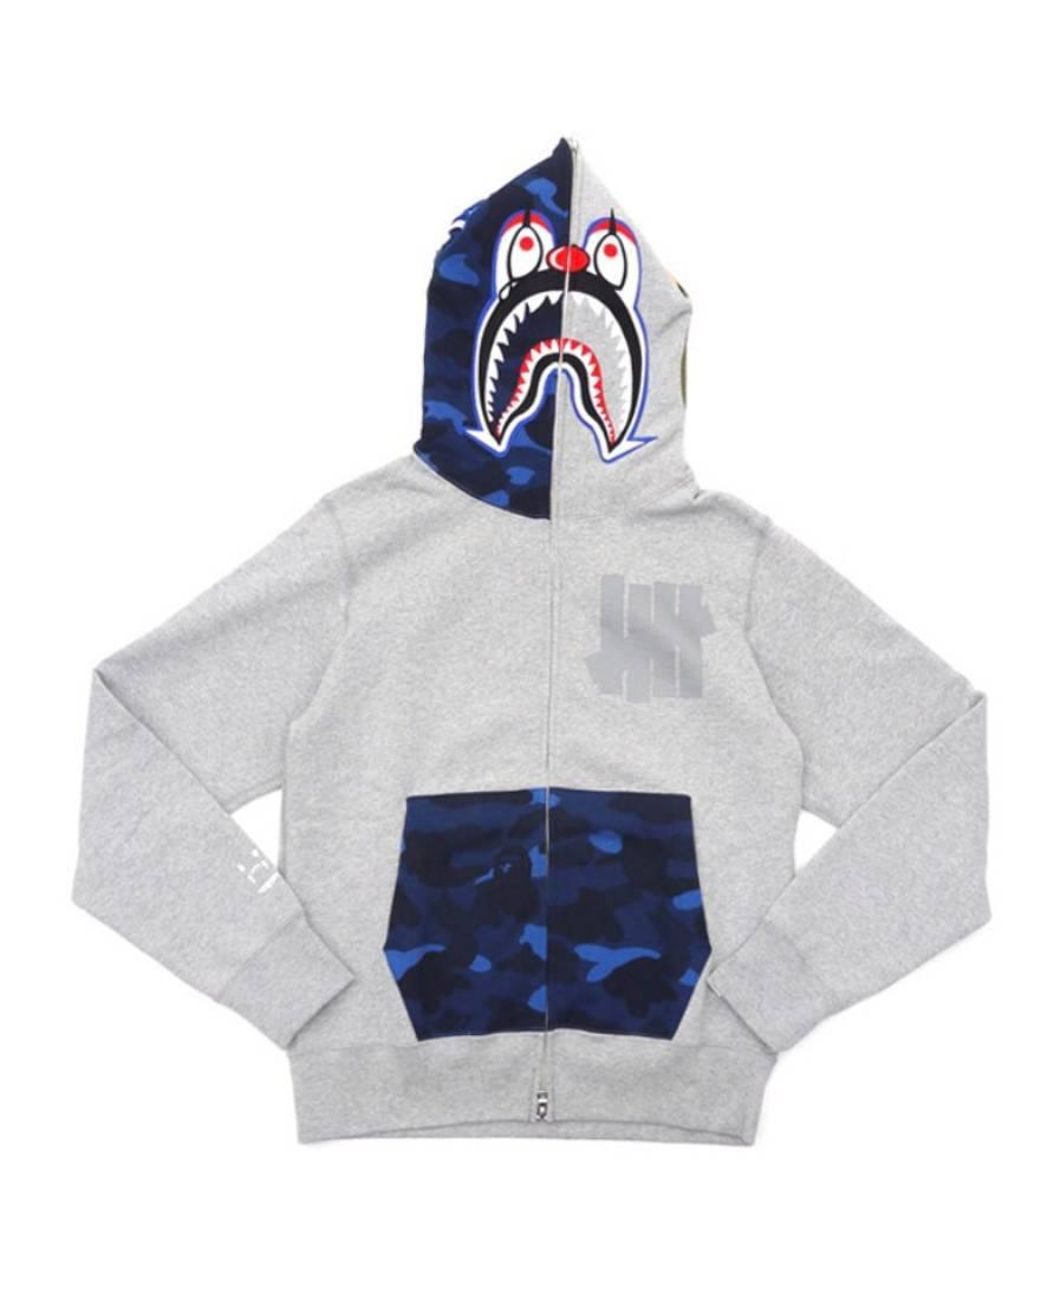 8996d63e A Bathing Ape X Undefeated Mr Cartoon Color Camo Hood/pocket Full Zip Clown Shark  Hoodie Grey/blue in Gray for Men - Lyst